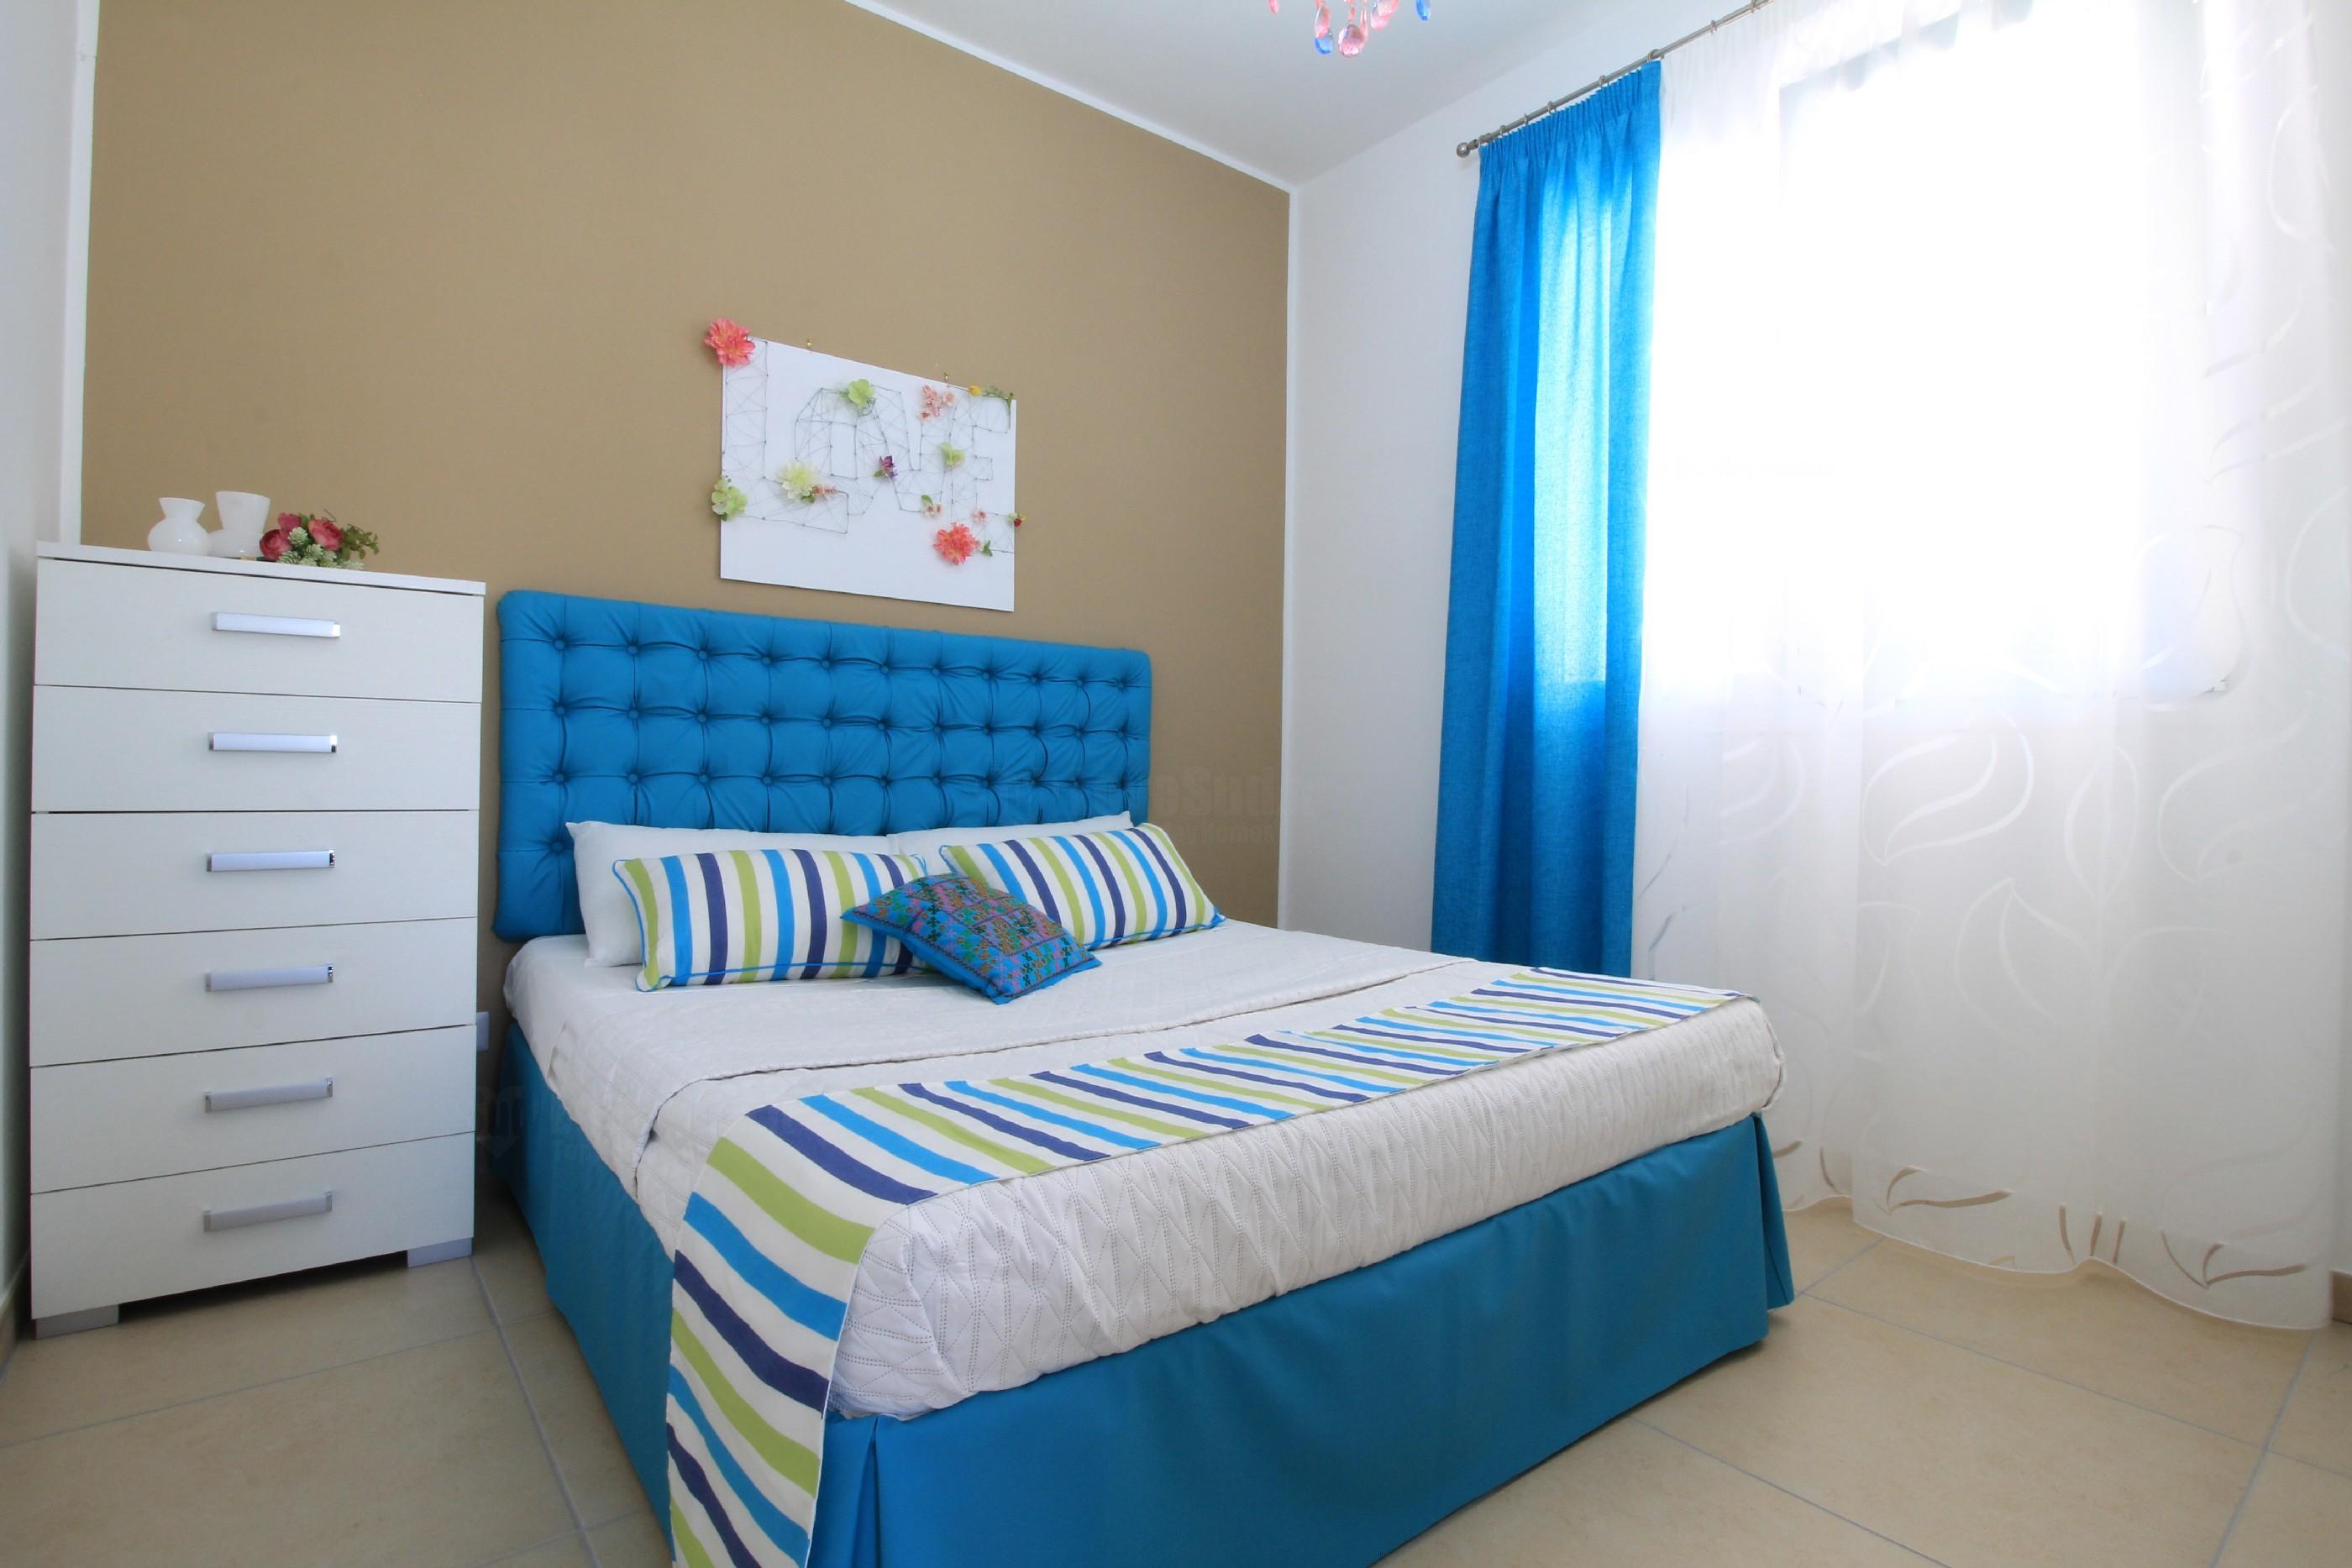 Elcisia luxe beach house photo 20260777